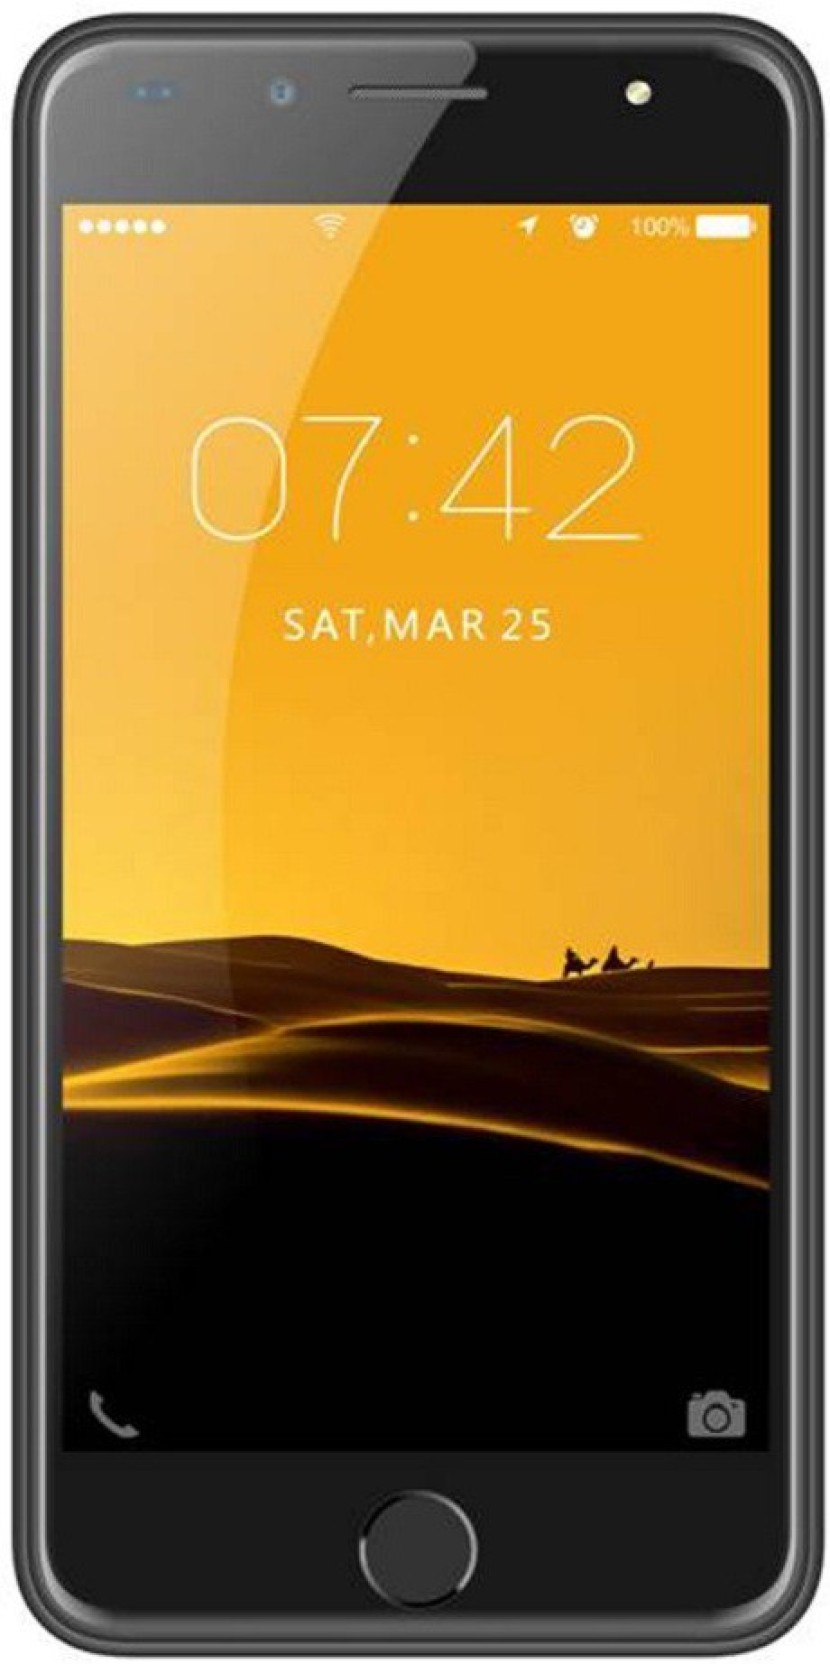 I Kall K30 1 8gb 4g Volte Smart Phone Black 8 Gb Online At Best Redmi 2 Ram Home